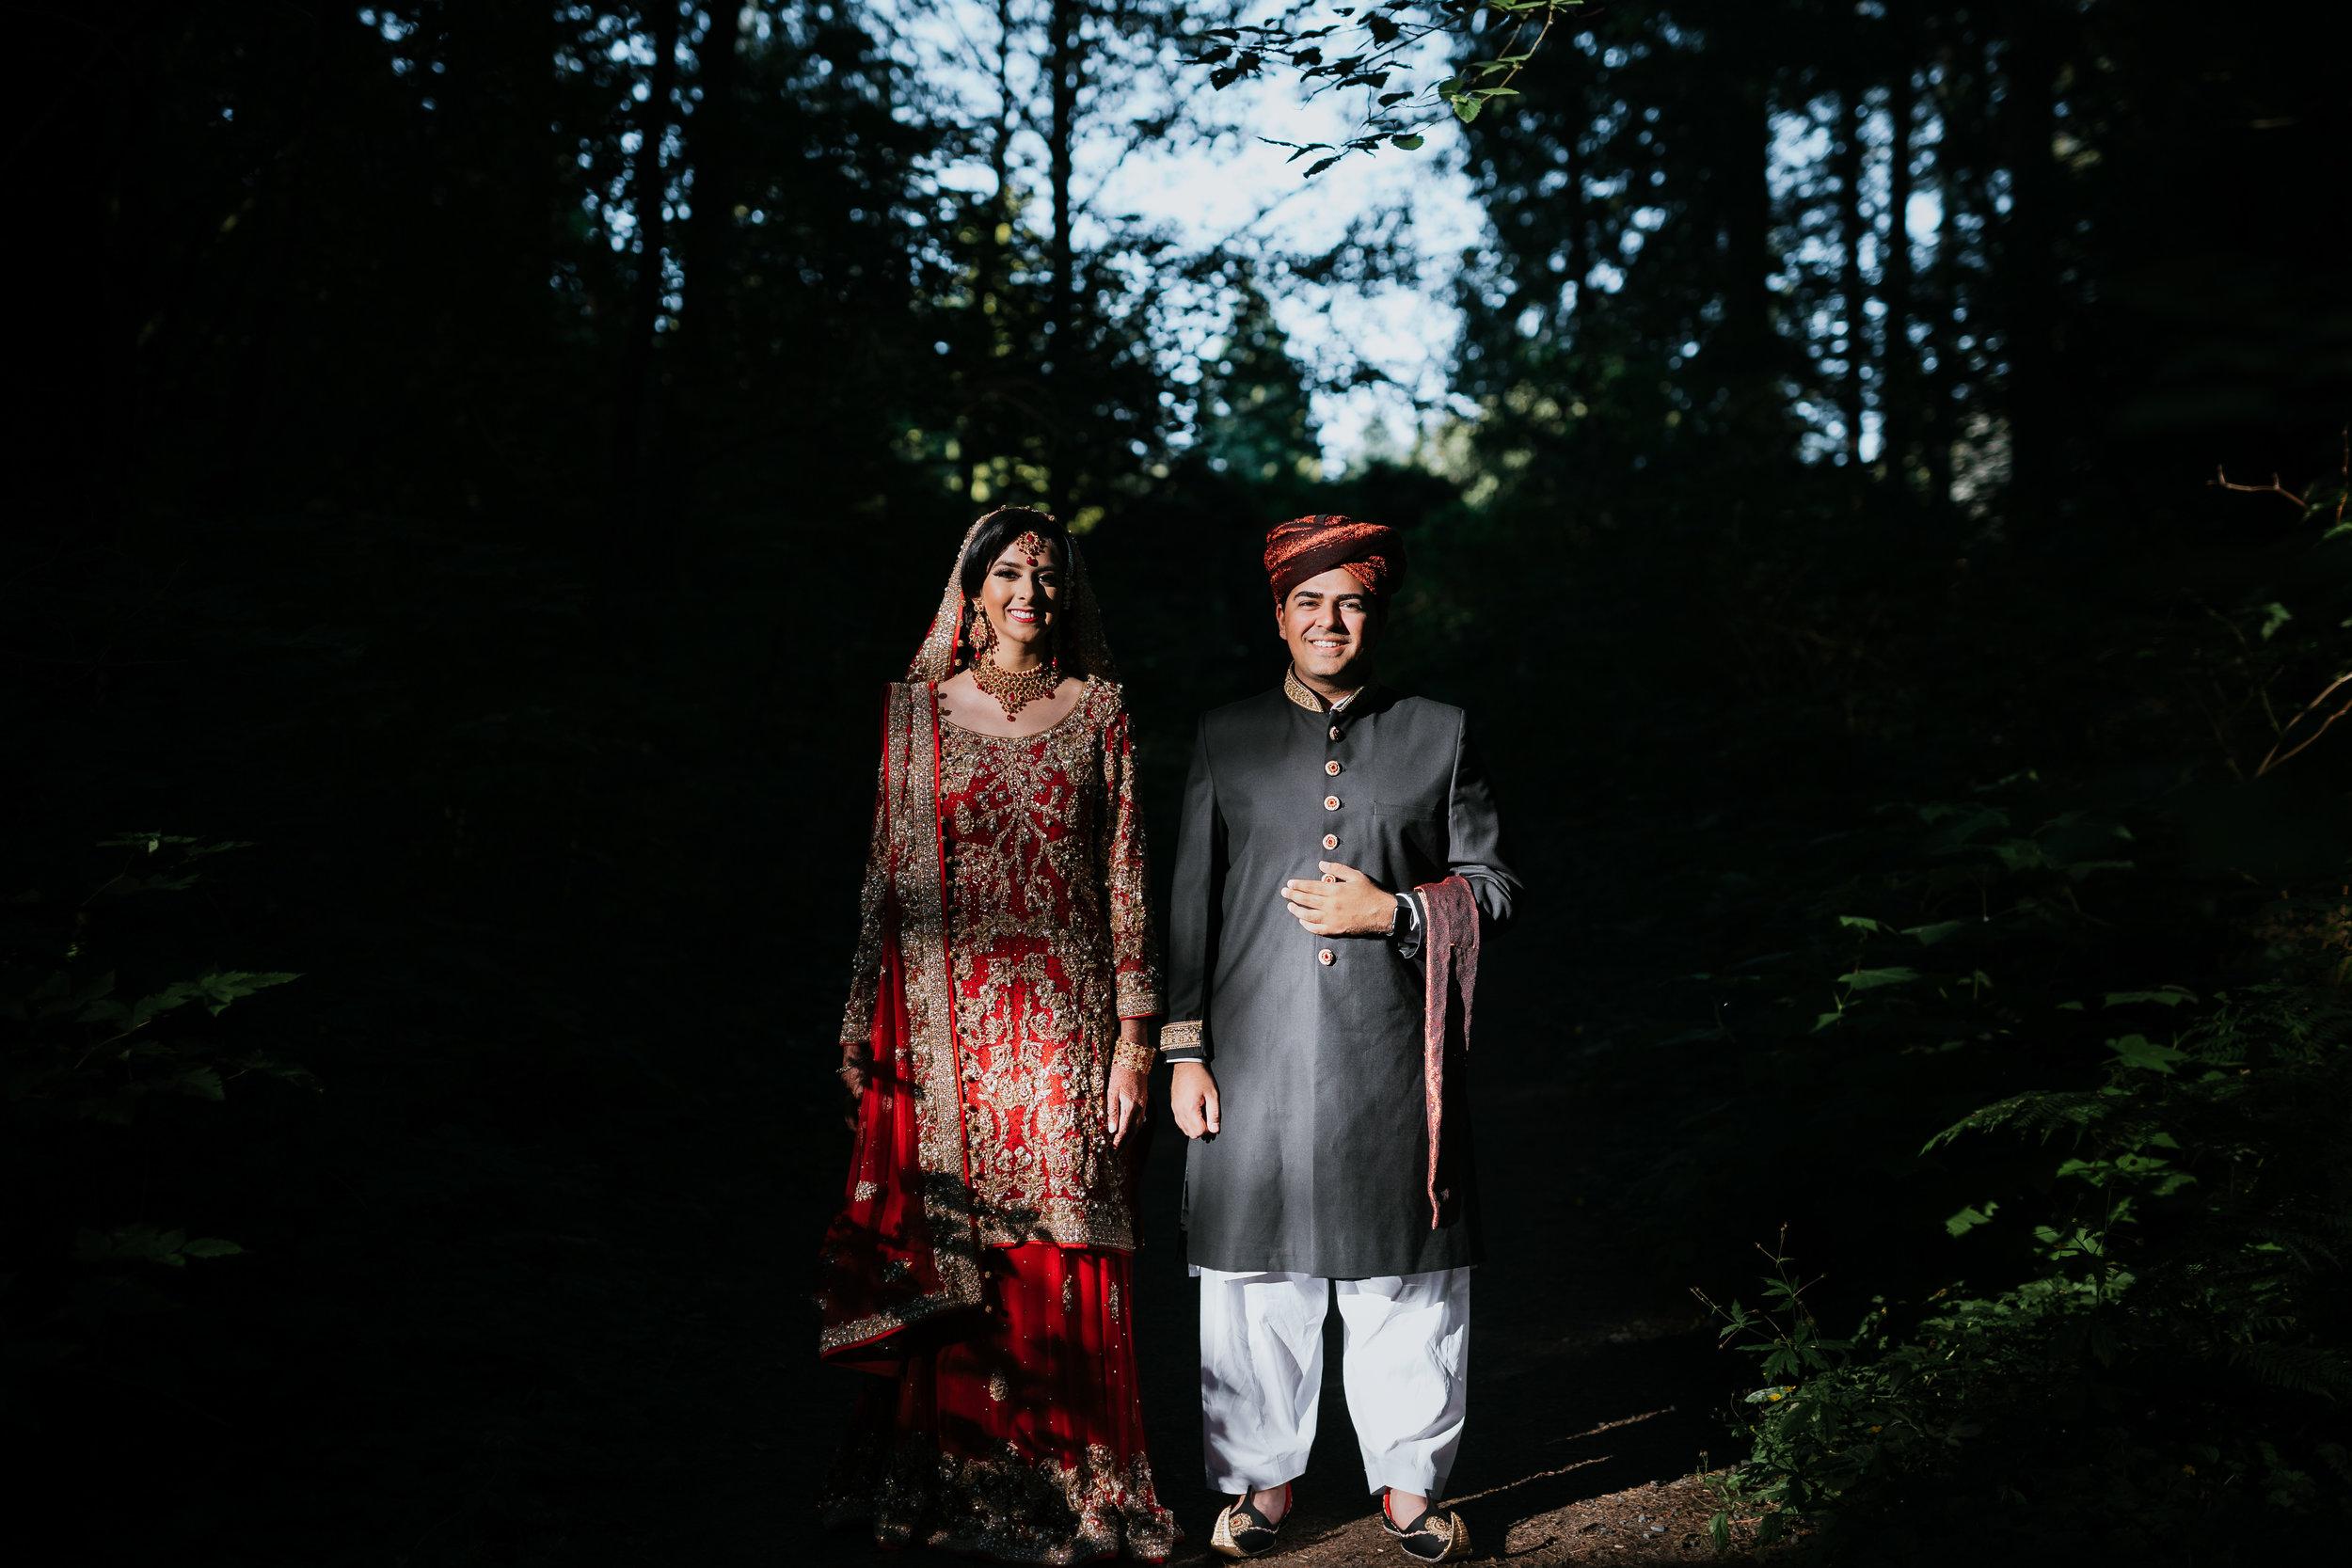 oliver-rabanes-photography-surrey-pakistani-wedding-03.jpg